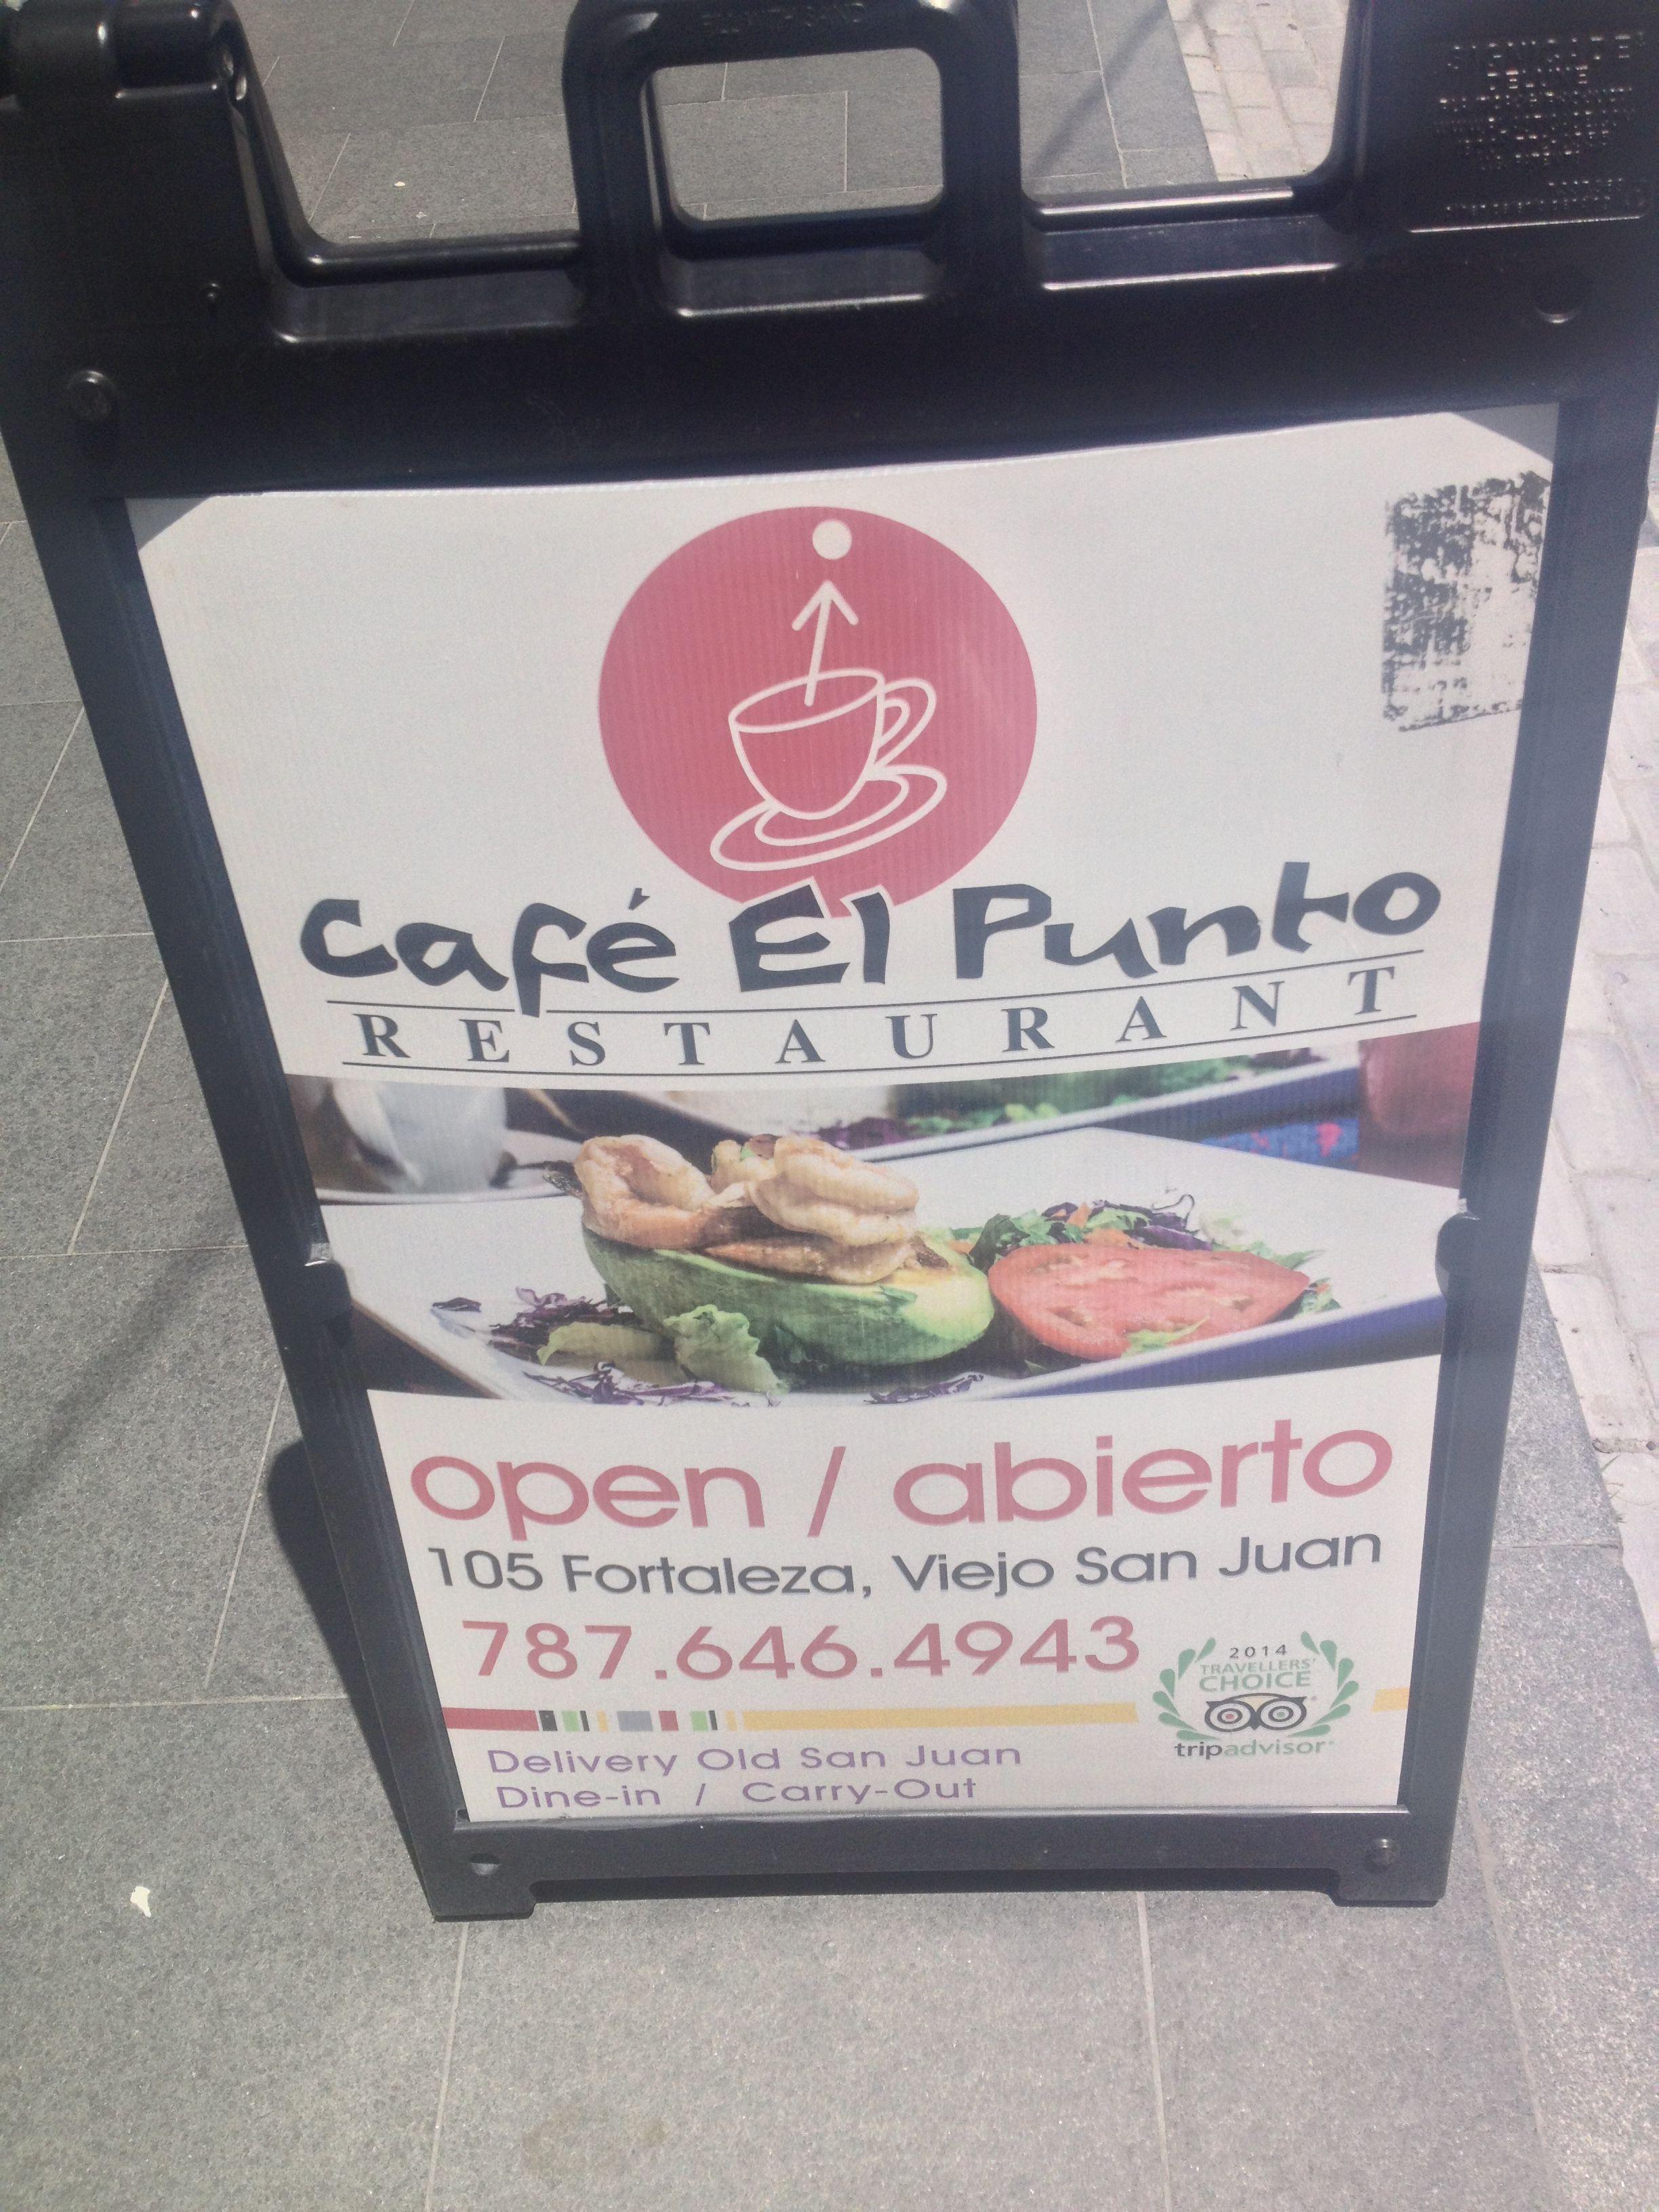 Best authentic food in San Juan, Puerto Rico